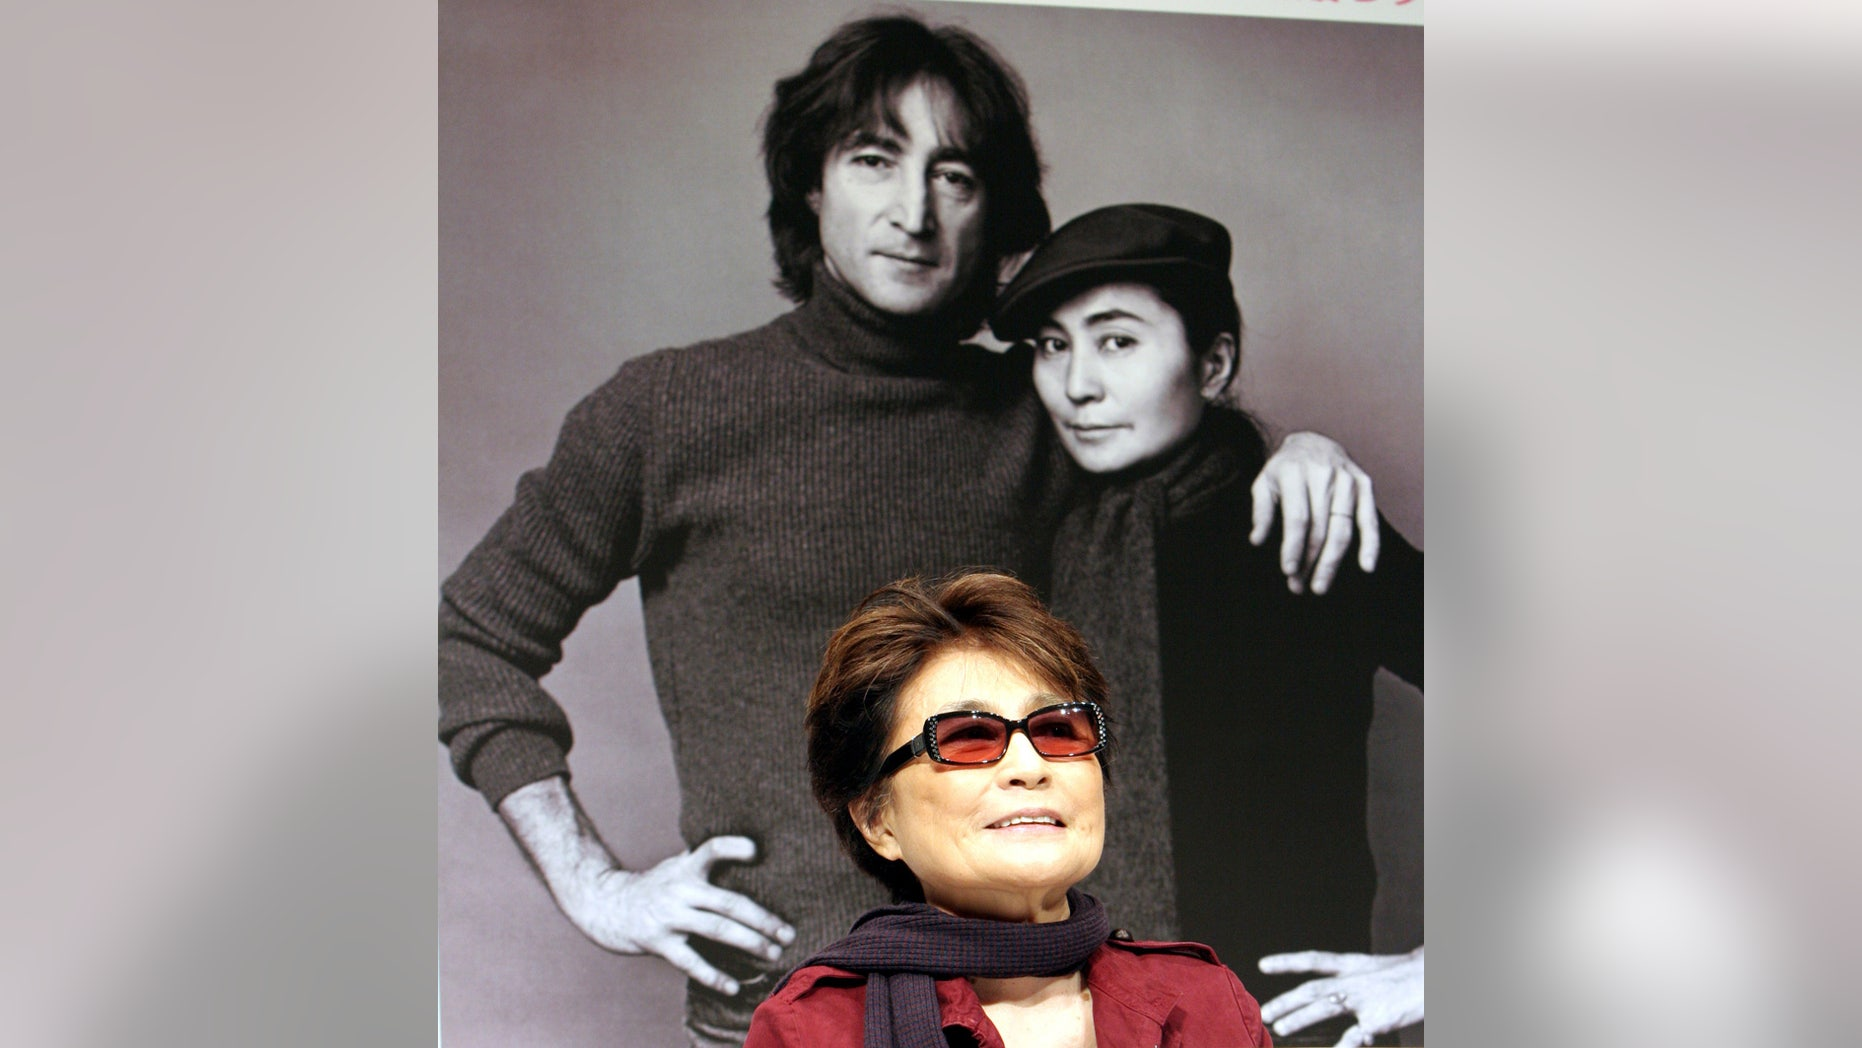 Yoko Ono, widow of former Beatles' John Lennon, speaks at a news conference in Tokyo November 2, 2006.